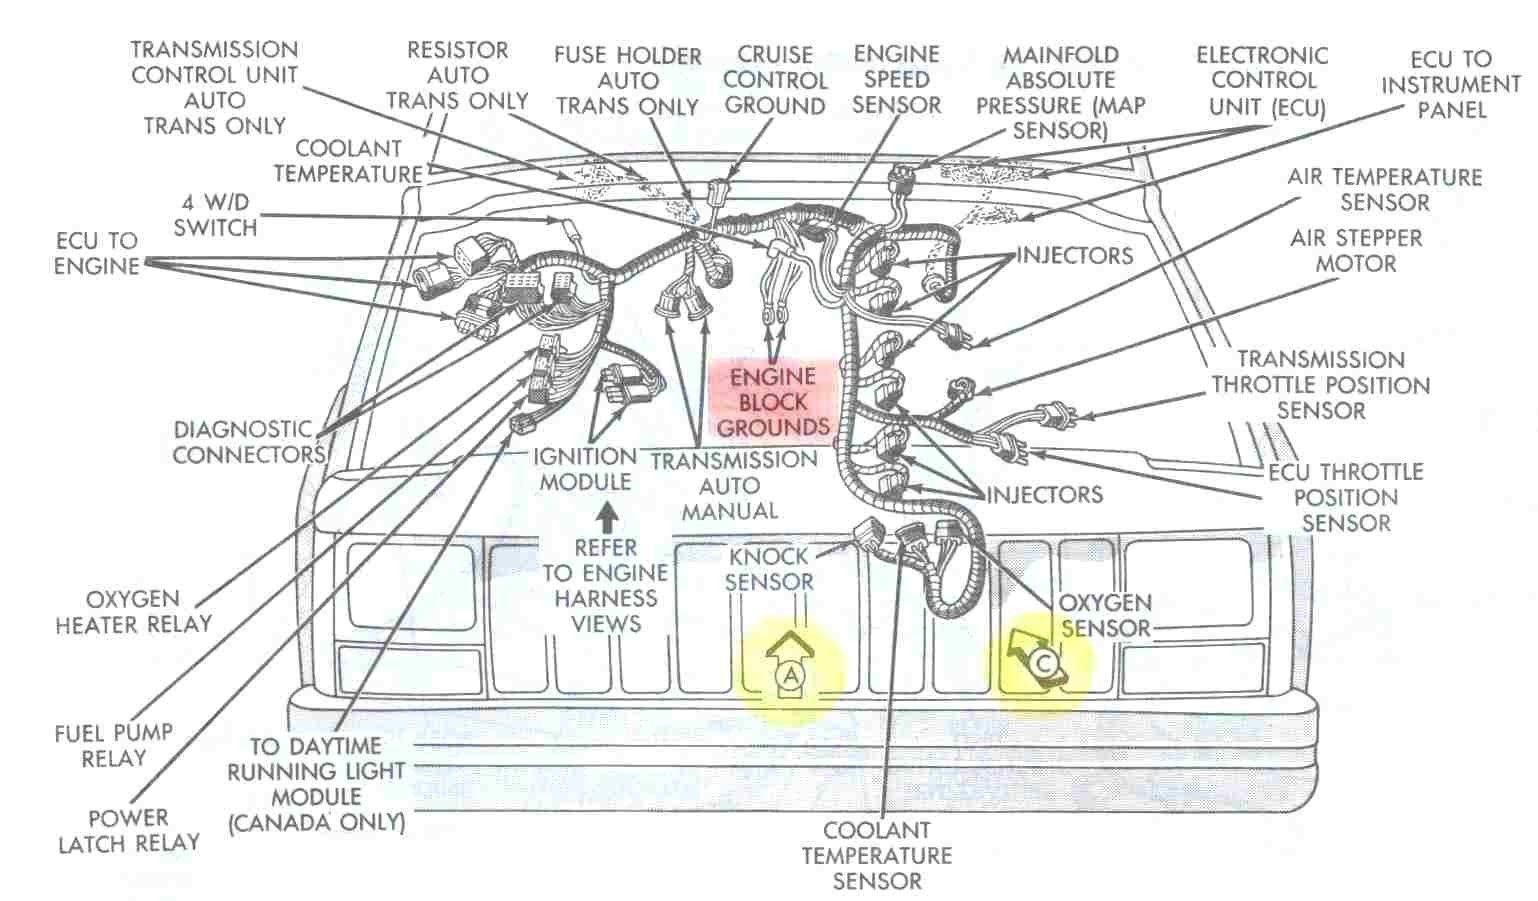 2001 Jeep Wrangler Wiring Diagram / Ac Wiring Diagram 2001